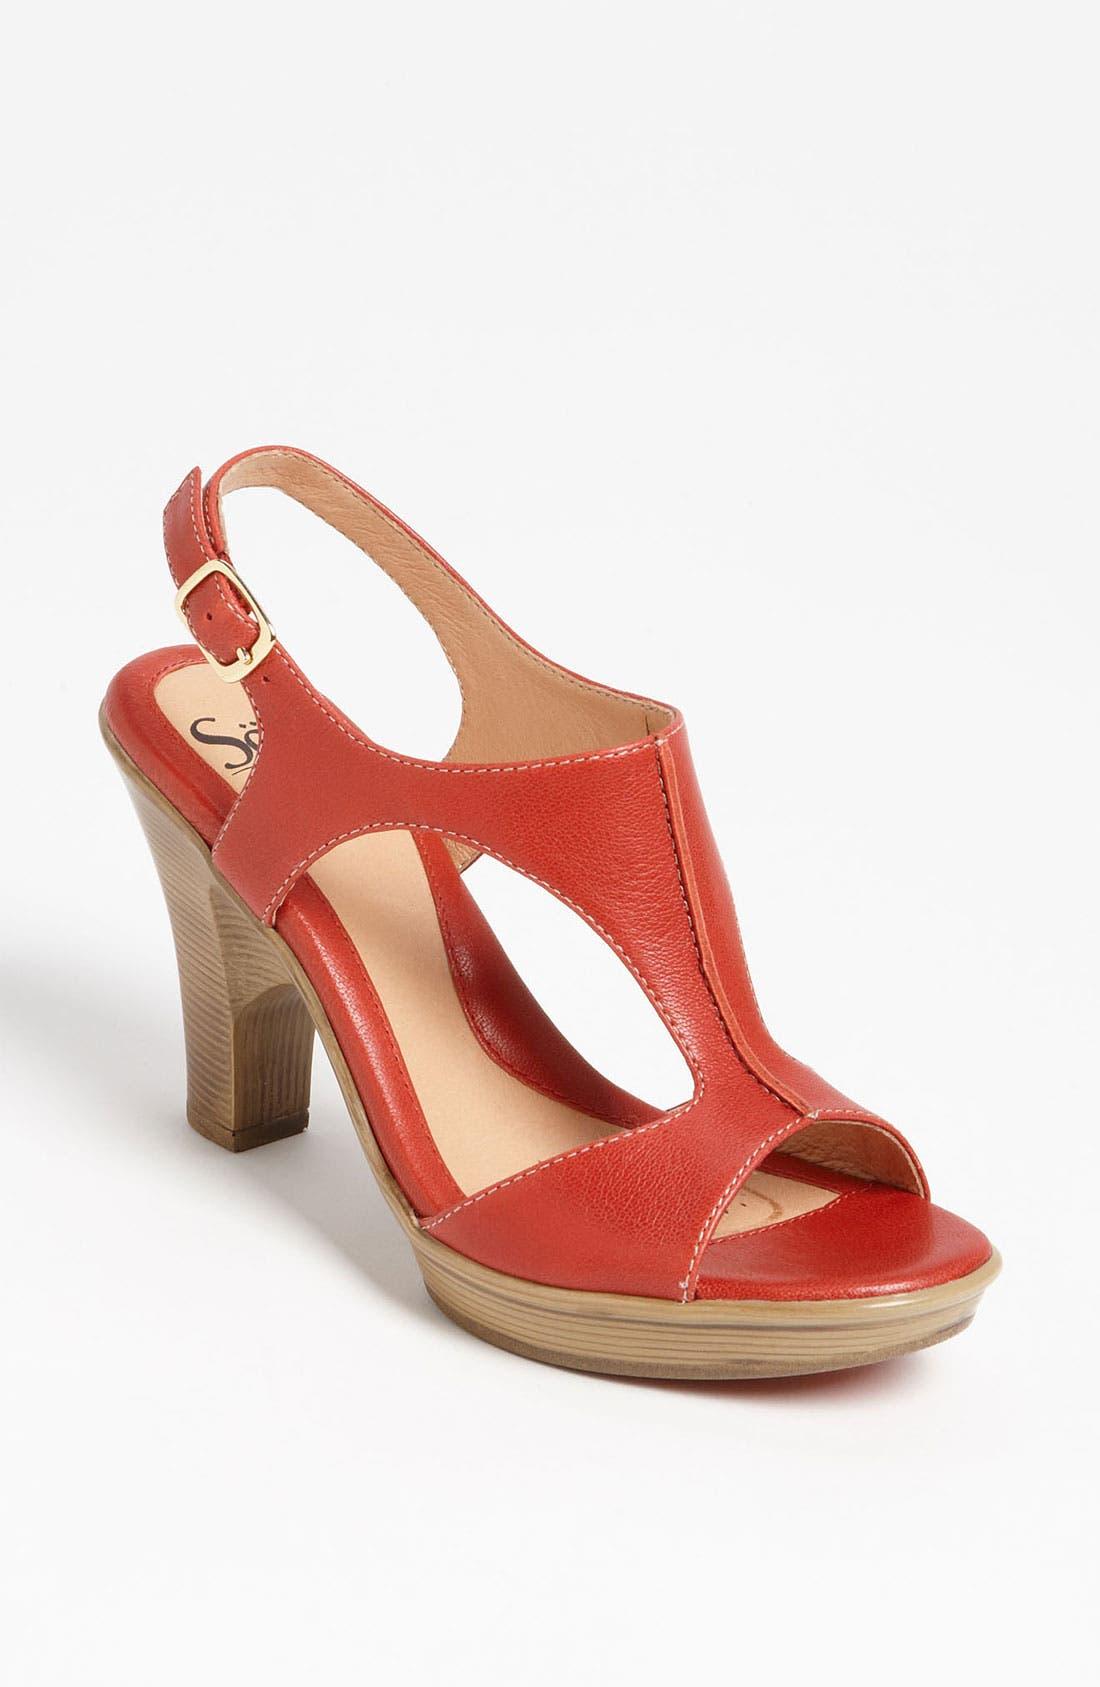 Main Image - Söfft 'Vannie' Sandal